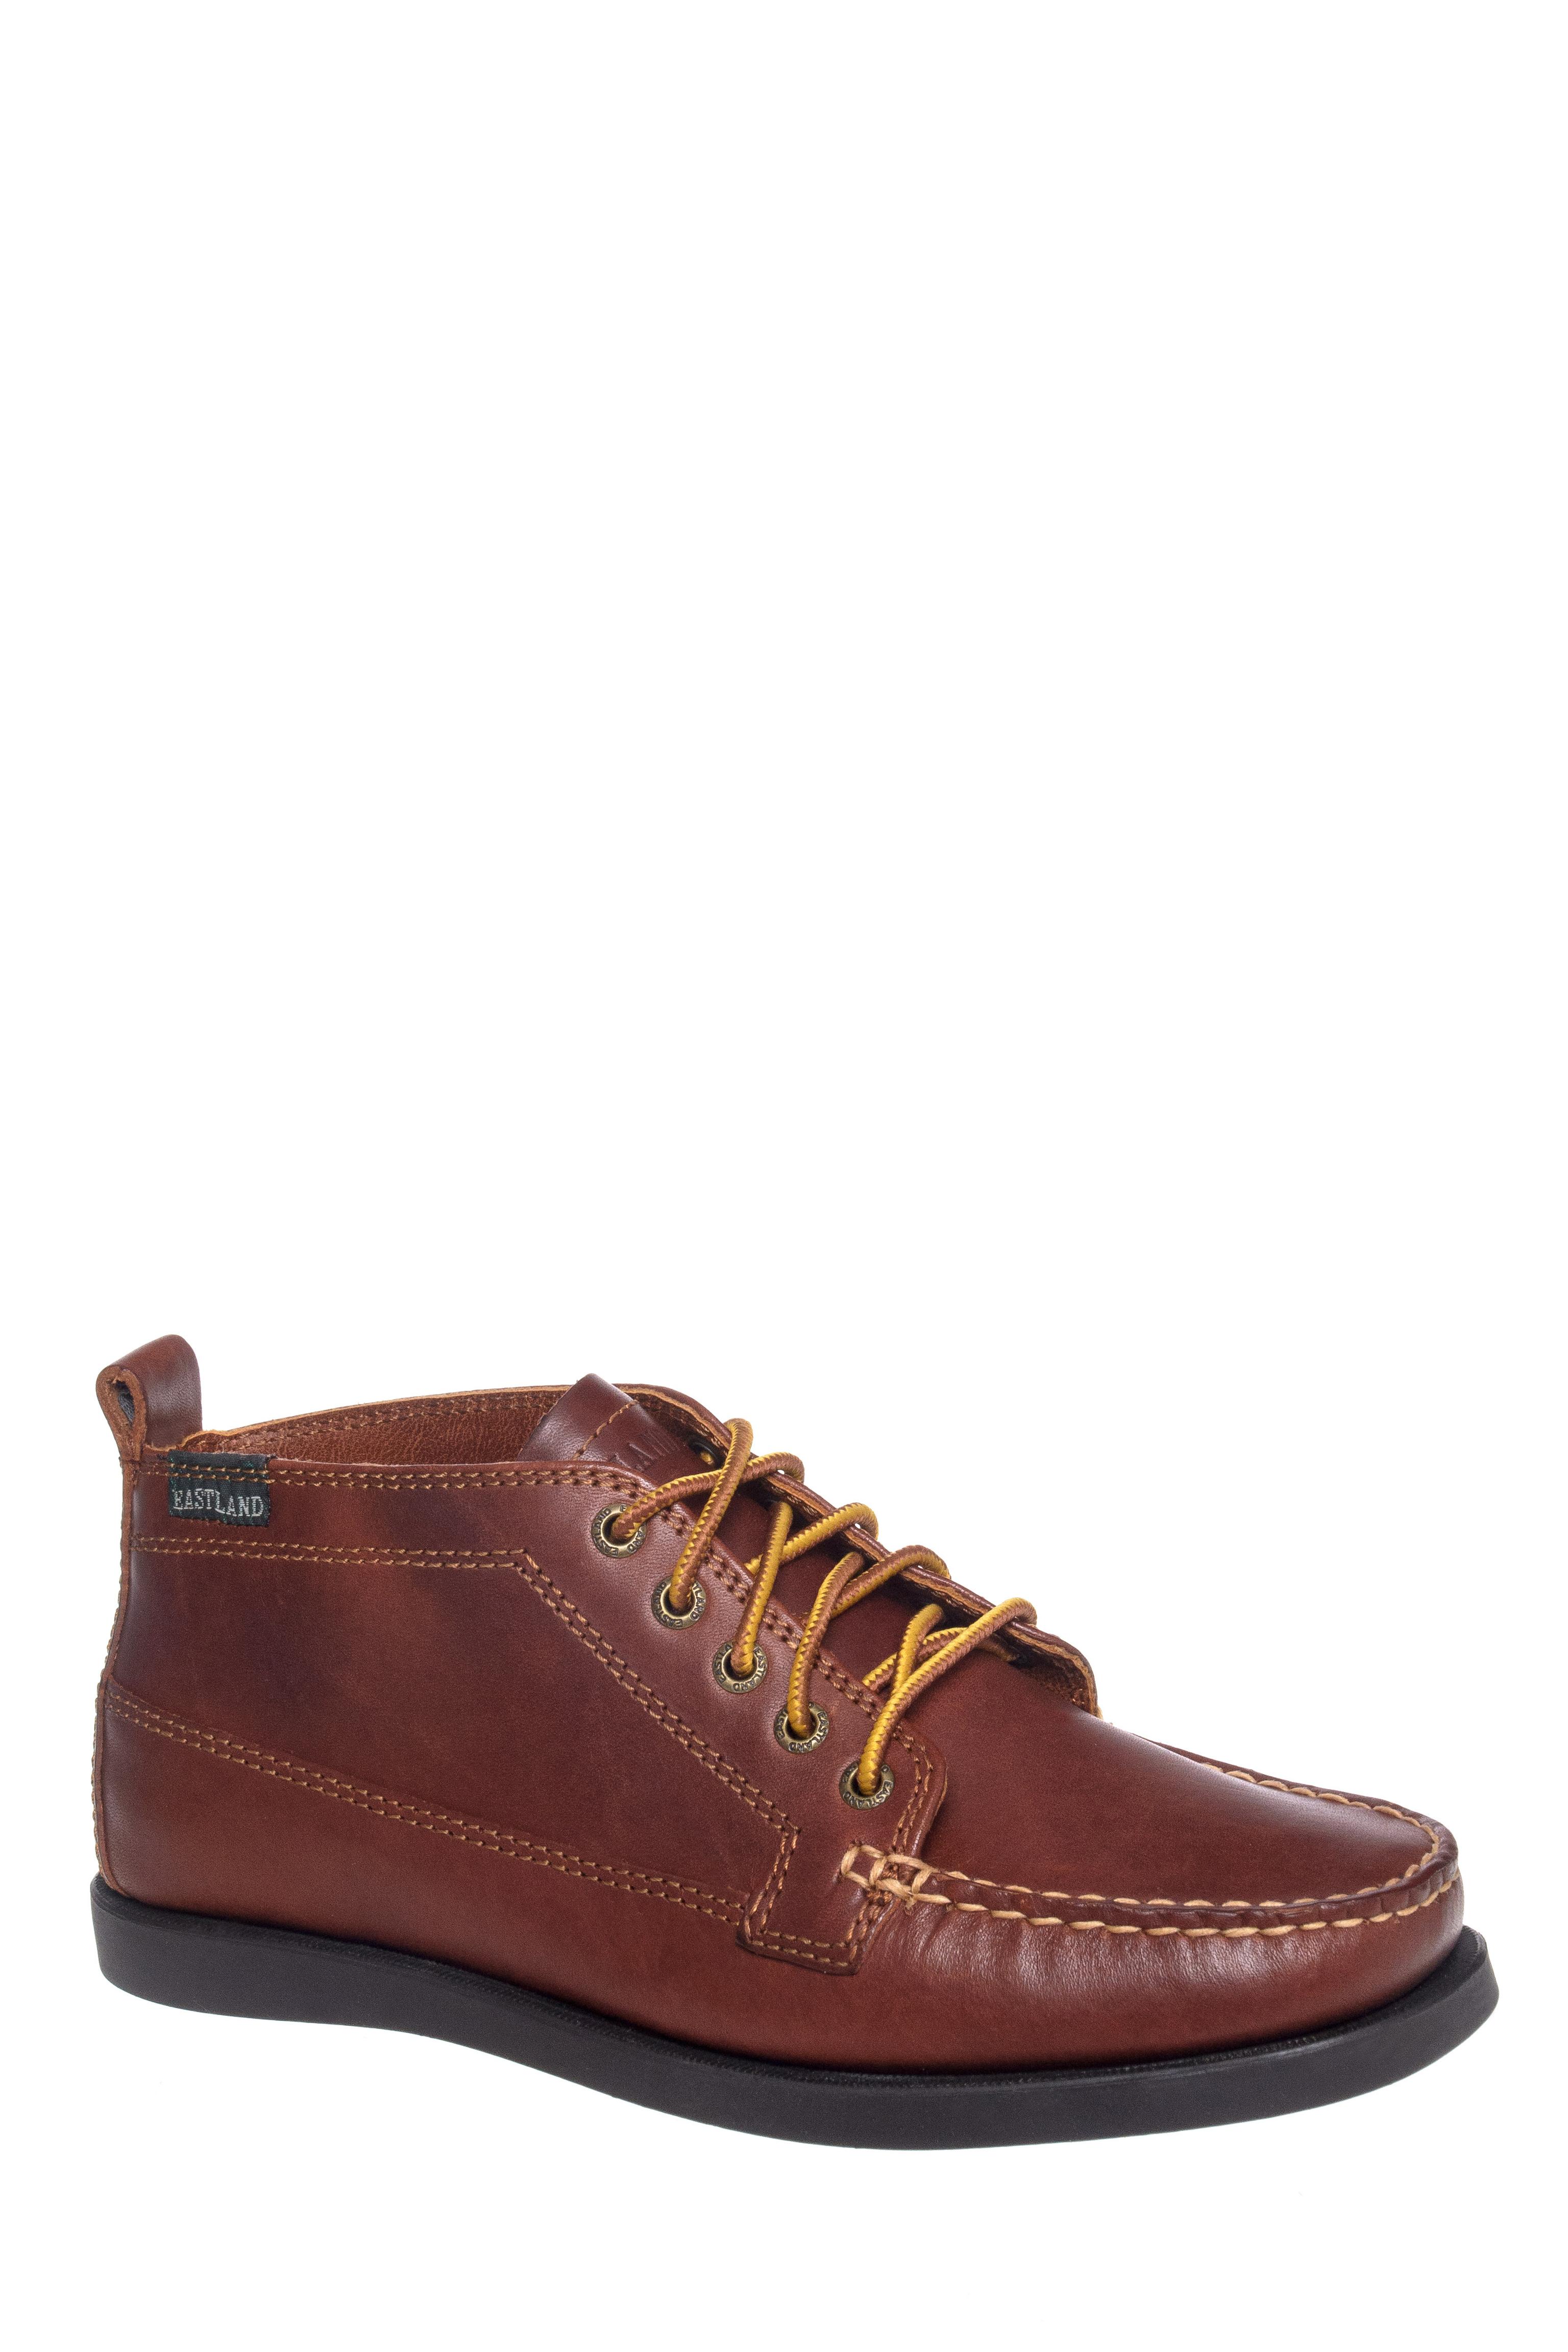 Eastland Seneca Moccasins Chukka Boots - Tan